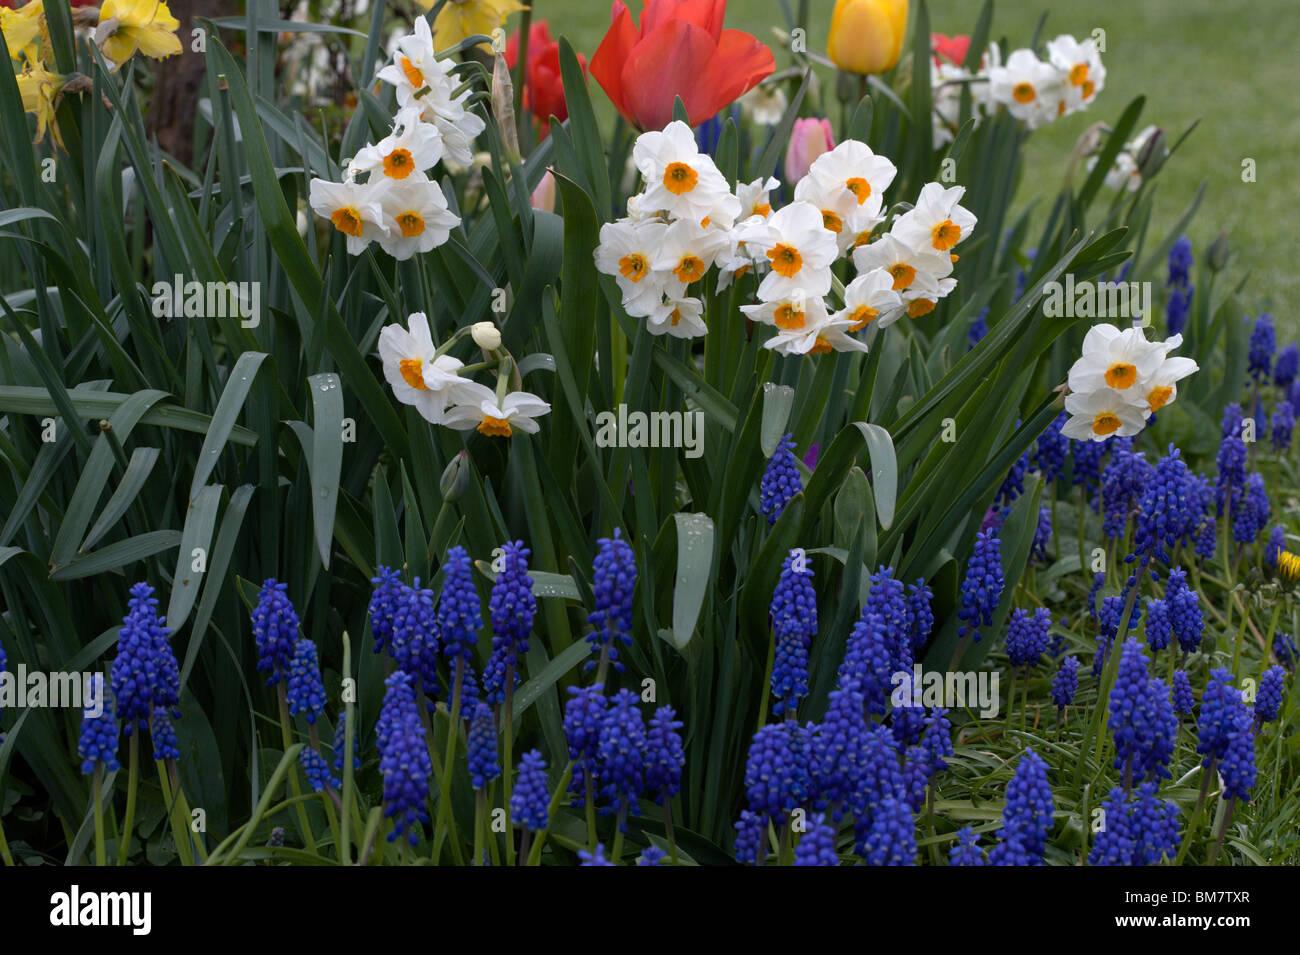 Grape Hyacinth Muscari  with daffodils and tulips Stock Photo